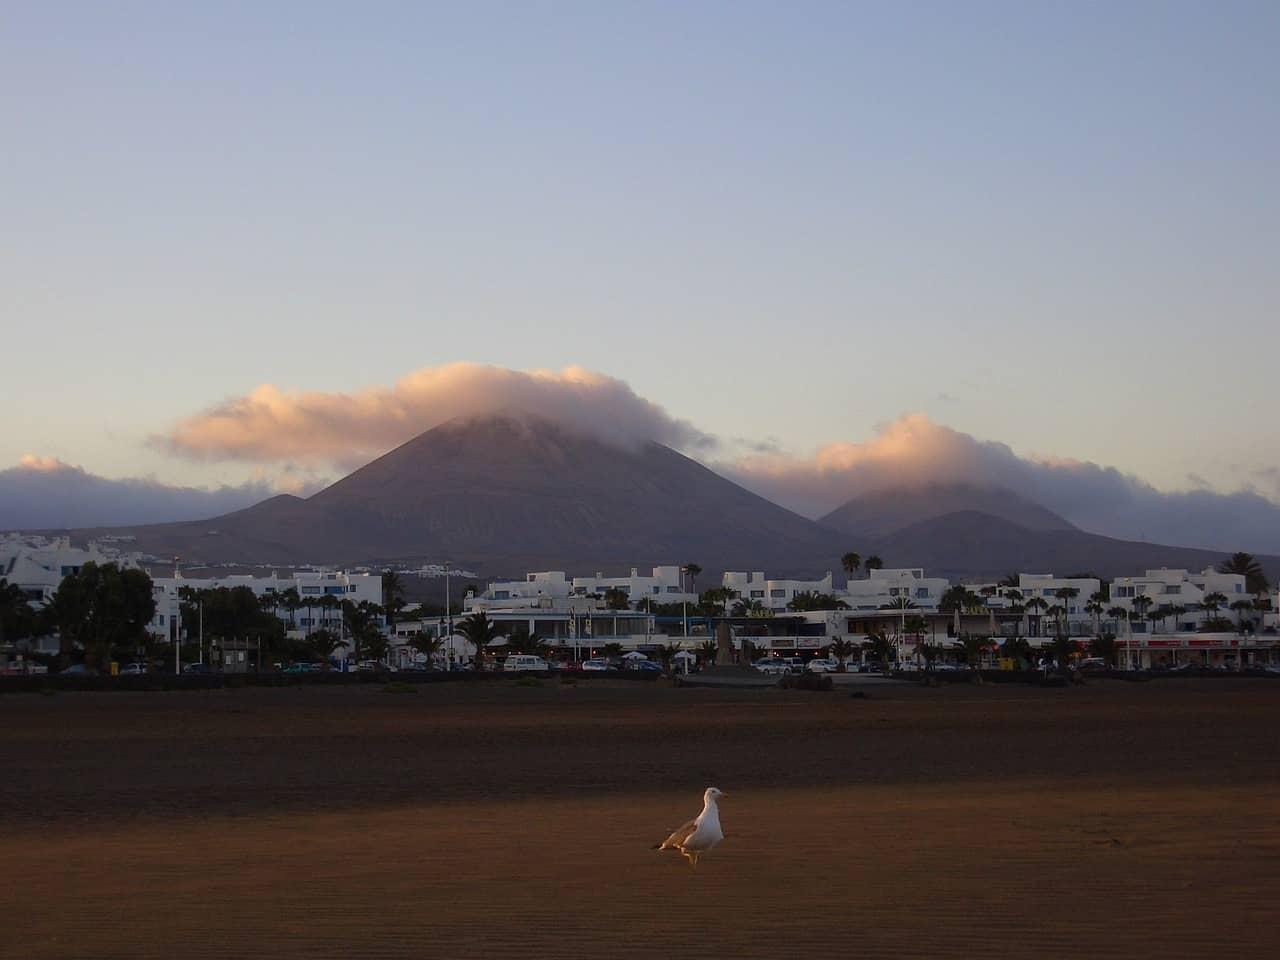 Walking tour in Fuerteventura